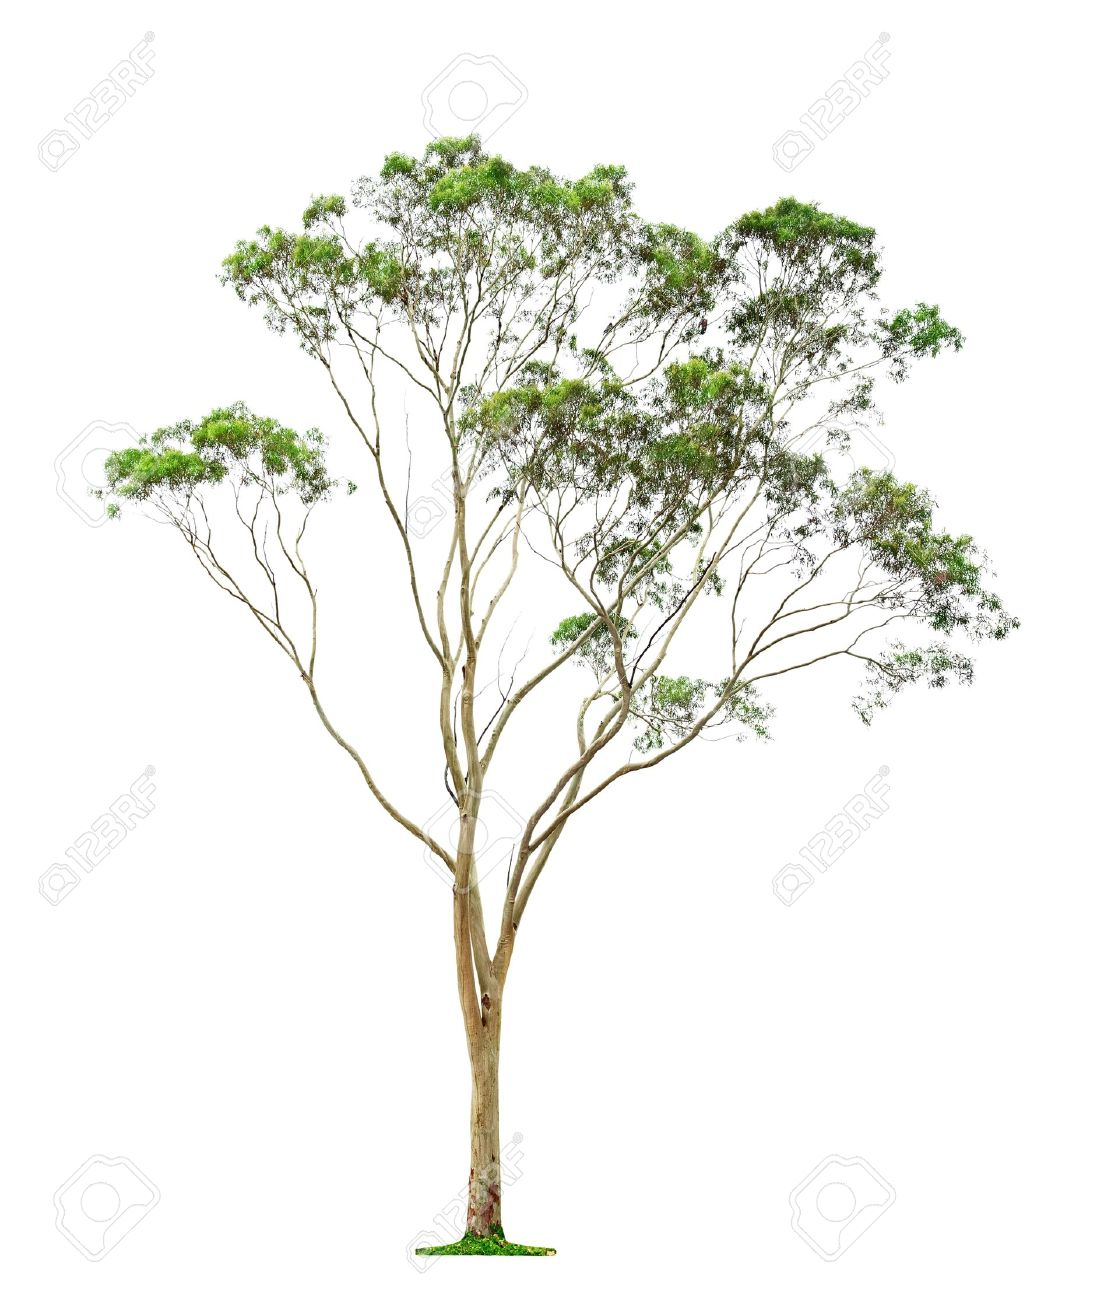 Eucalyptus Gum Tree clipart #3, Download drawings